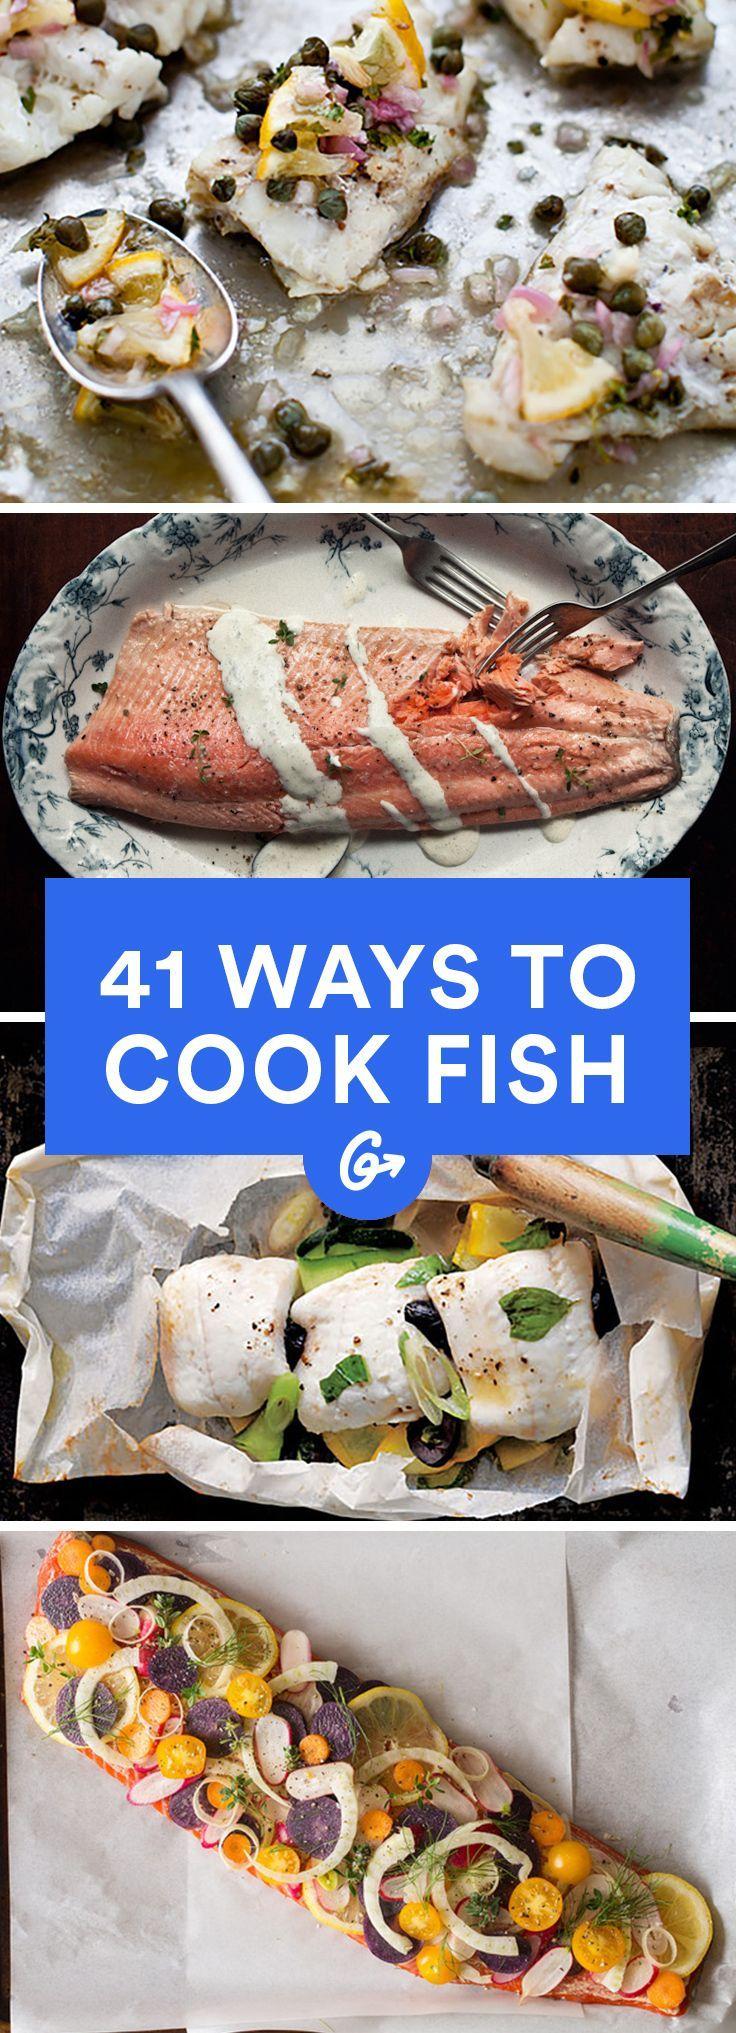 Ways to Cook Fish